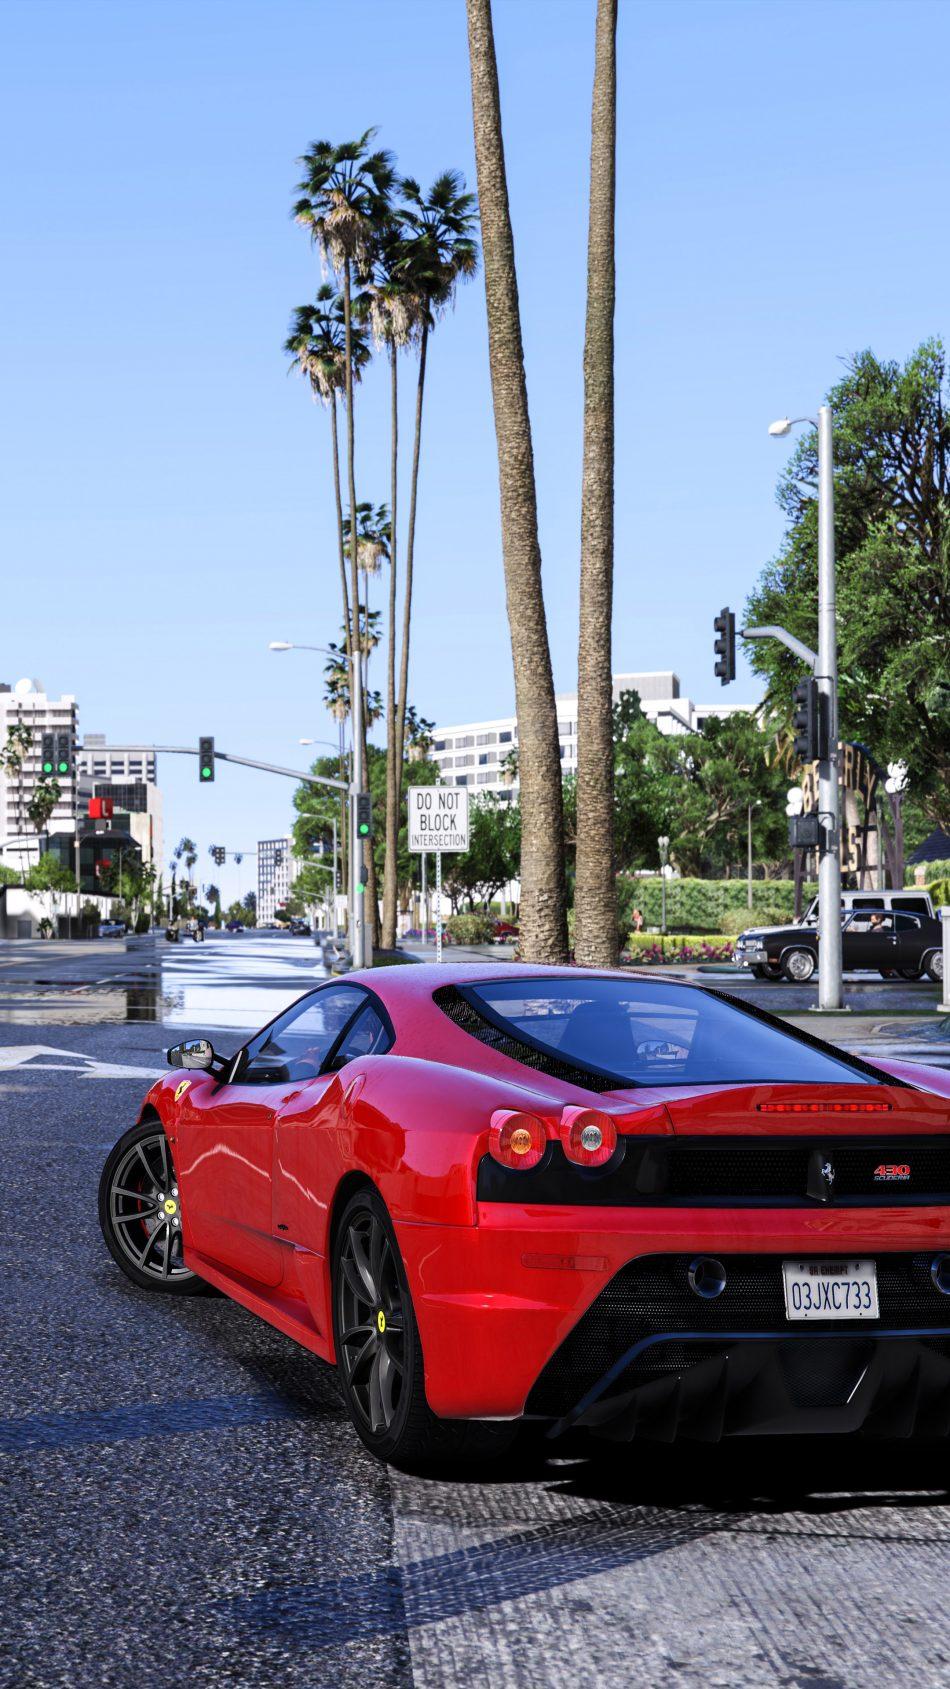 Download Gta V Red Ferrari Free Pure 4k Ultra Hd Mobile Wallpaper